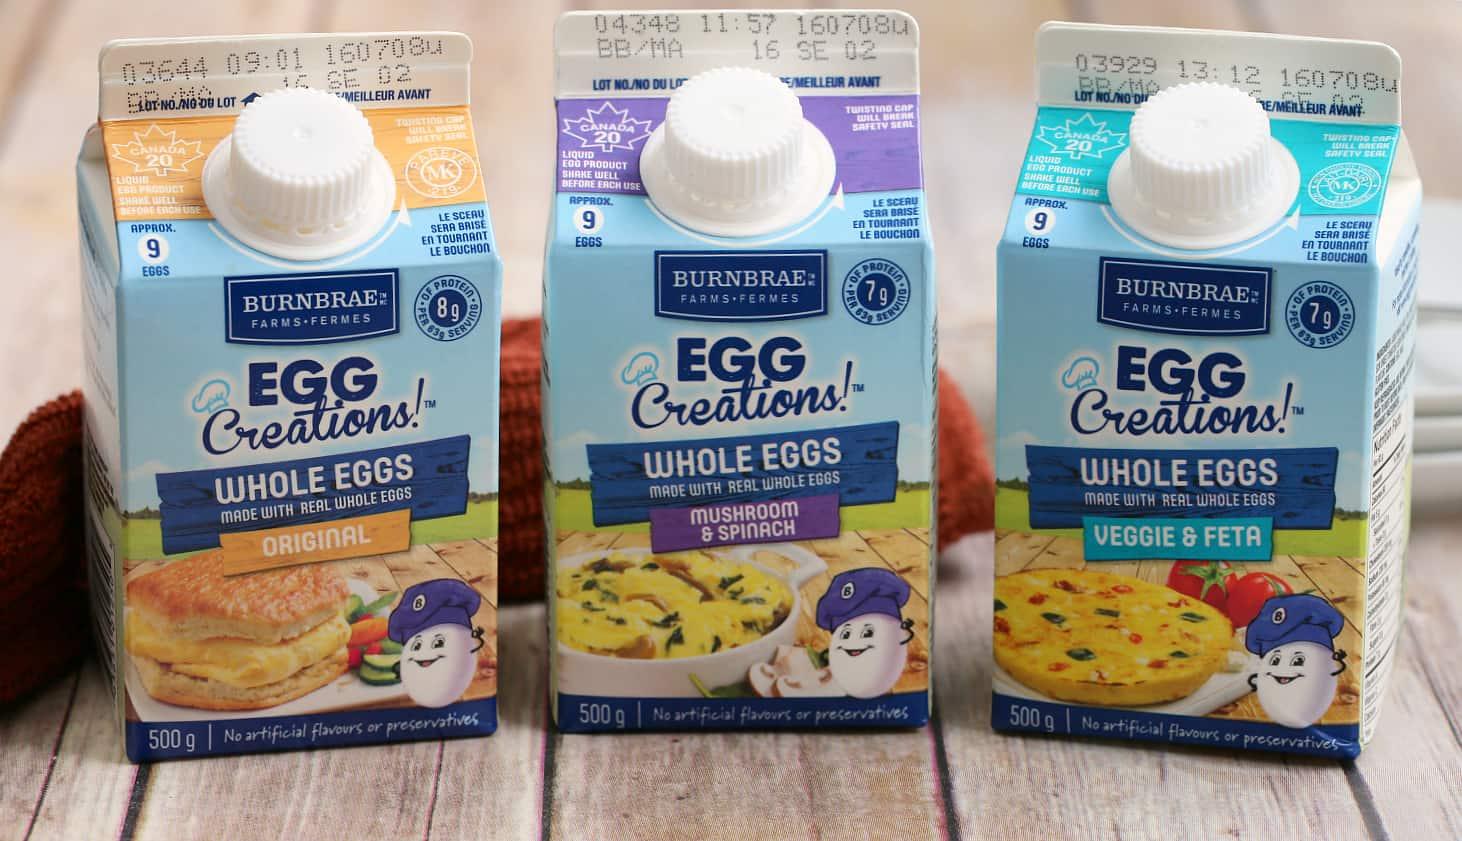 burnbrae farms egg creations whole eggs eggsforlife